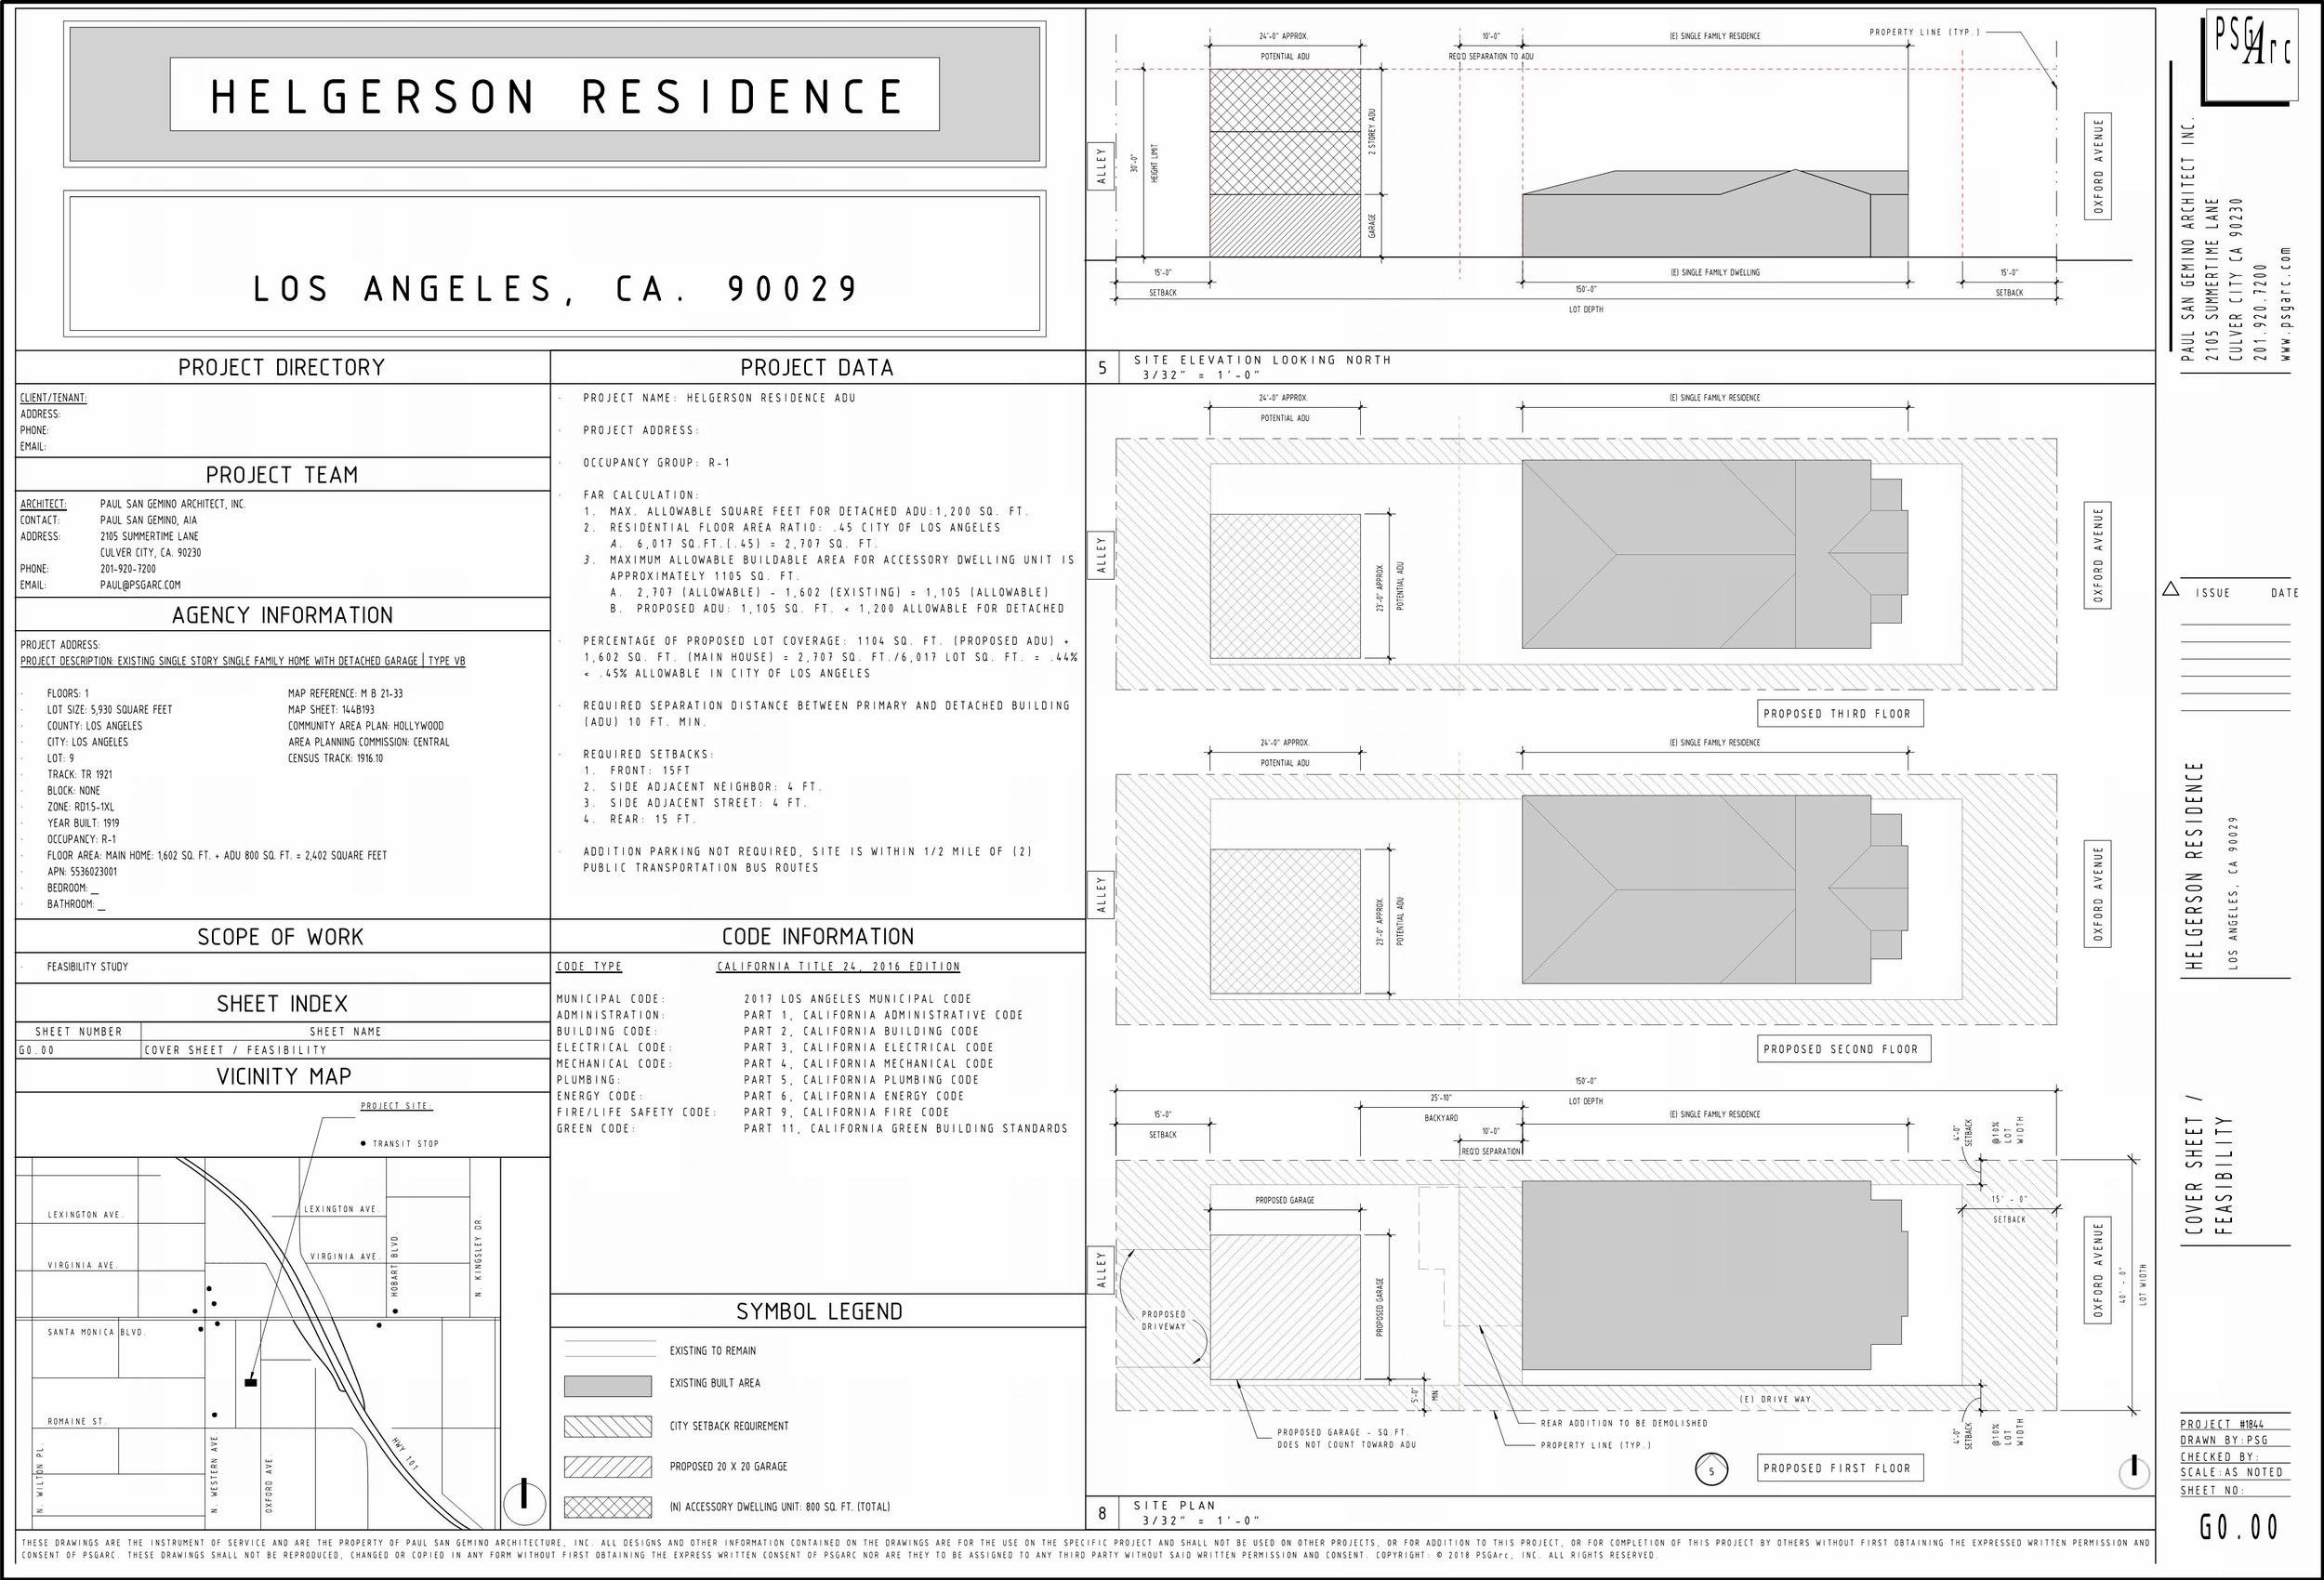 PSGArc_Feasibility_Helgerson.jpg